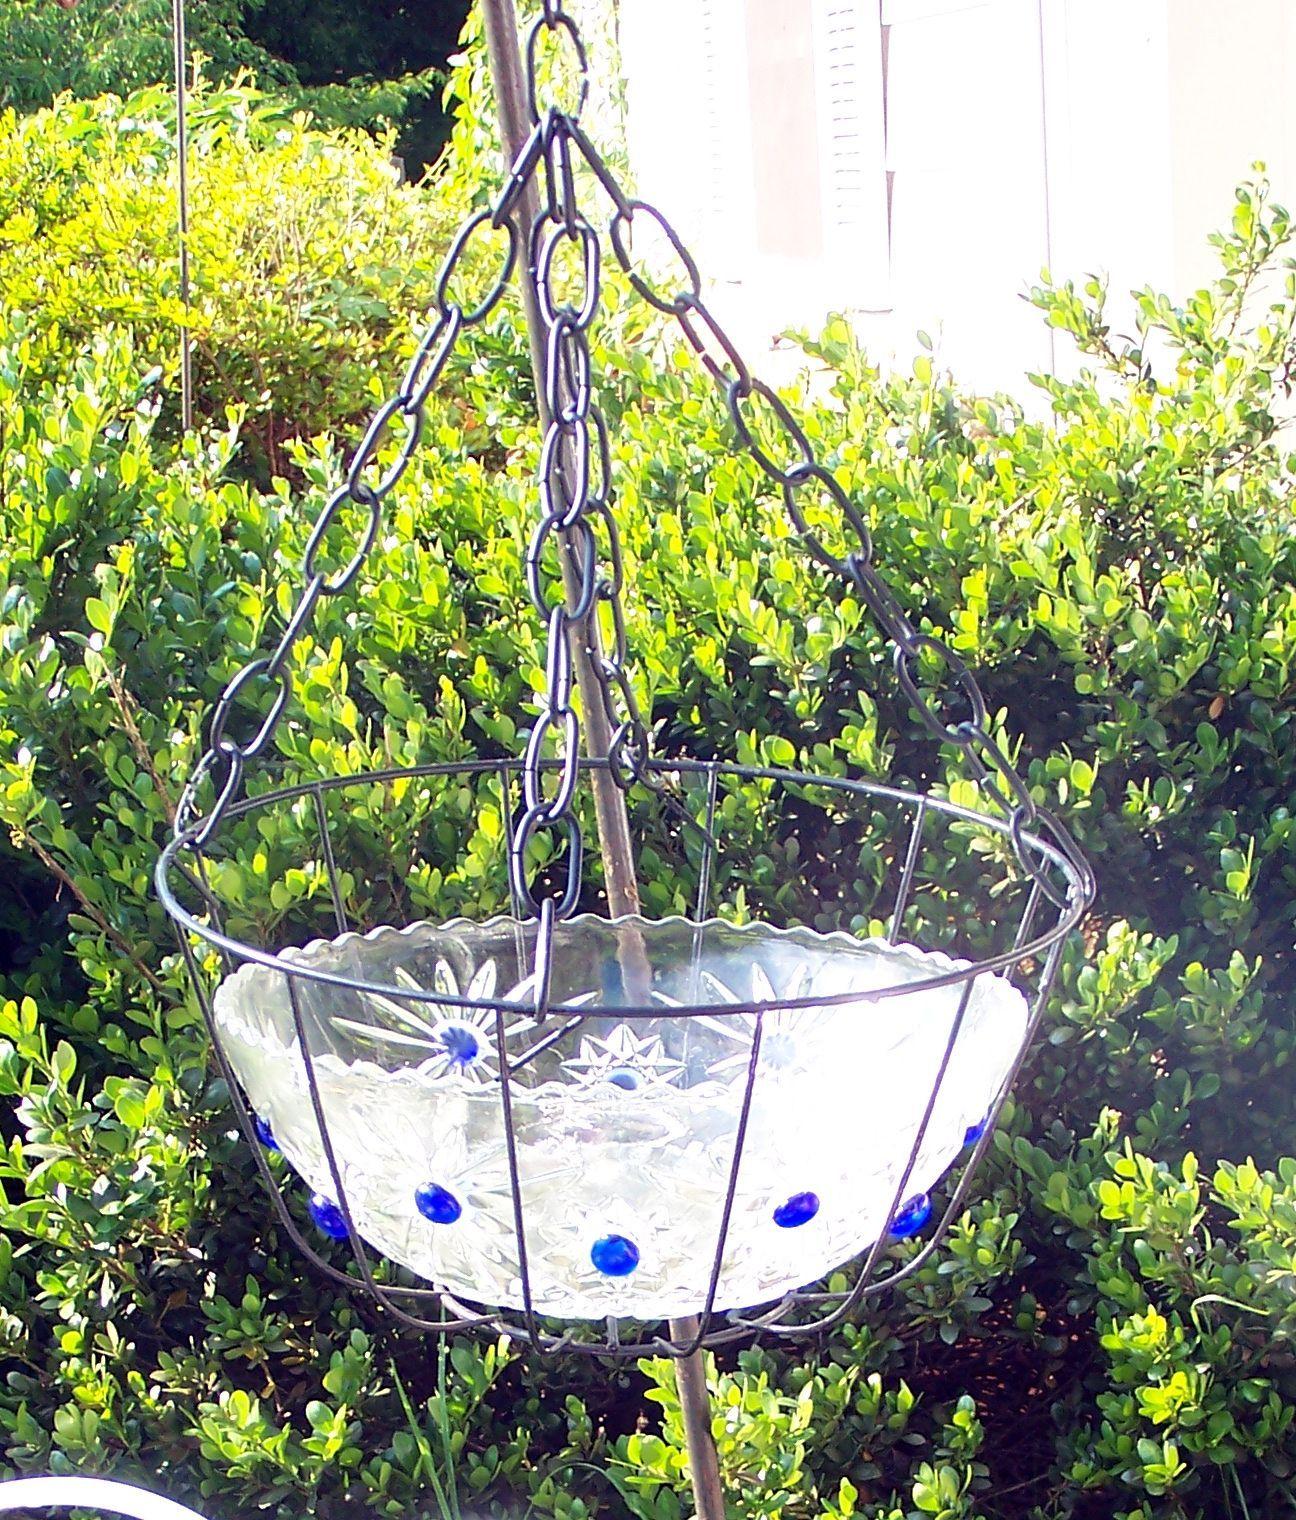 Shabby Chic Hanging Bird Bath Repurpose That Old Glass Bowl